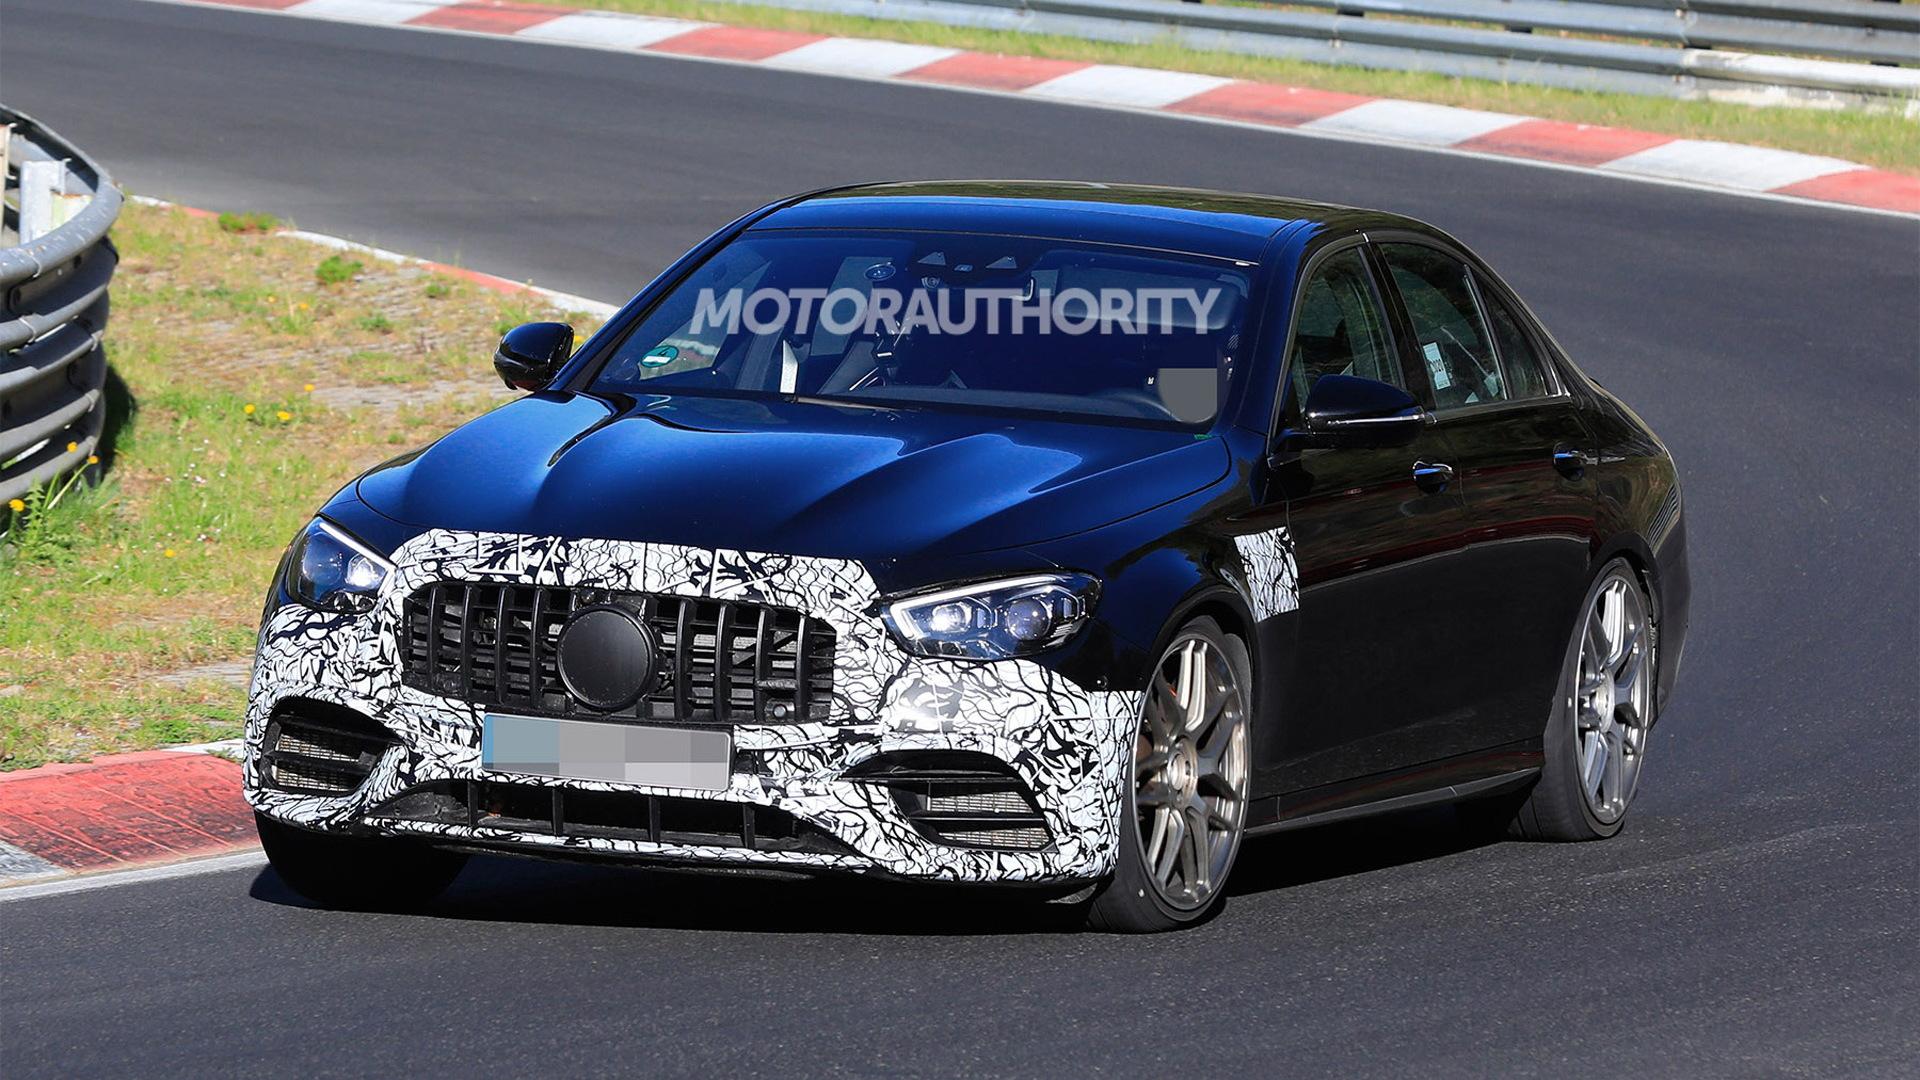 2021 Mercedes-AMG E63 facelift spy shots - Photo credit: S. Baldauf/SB-Medien